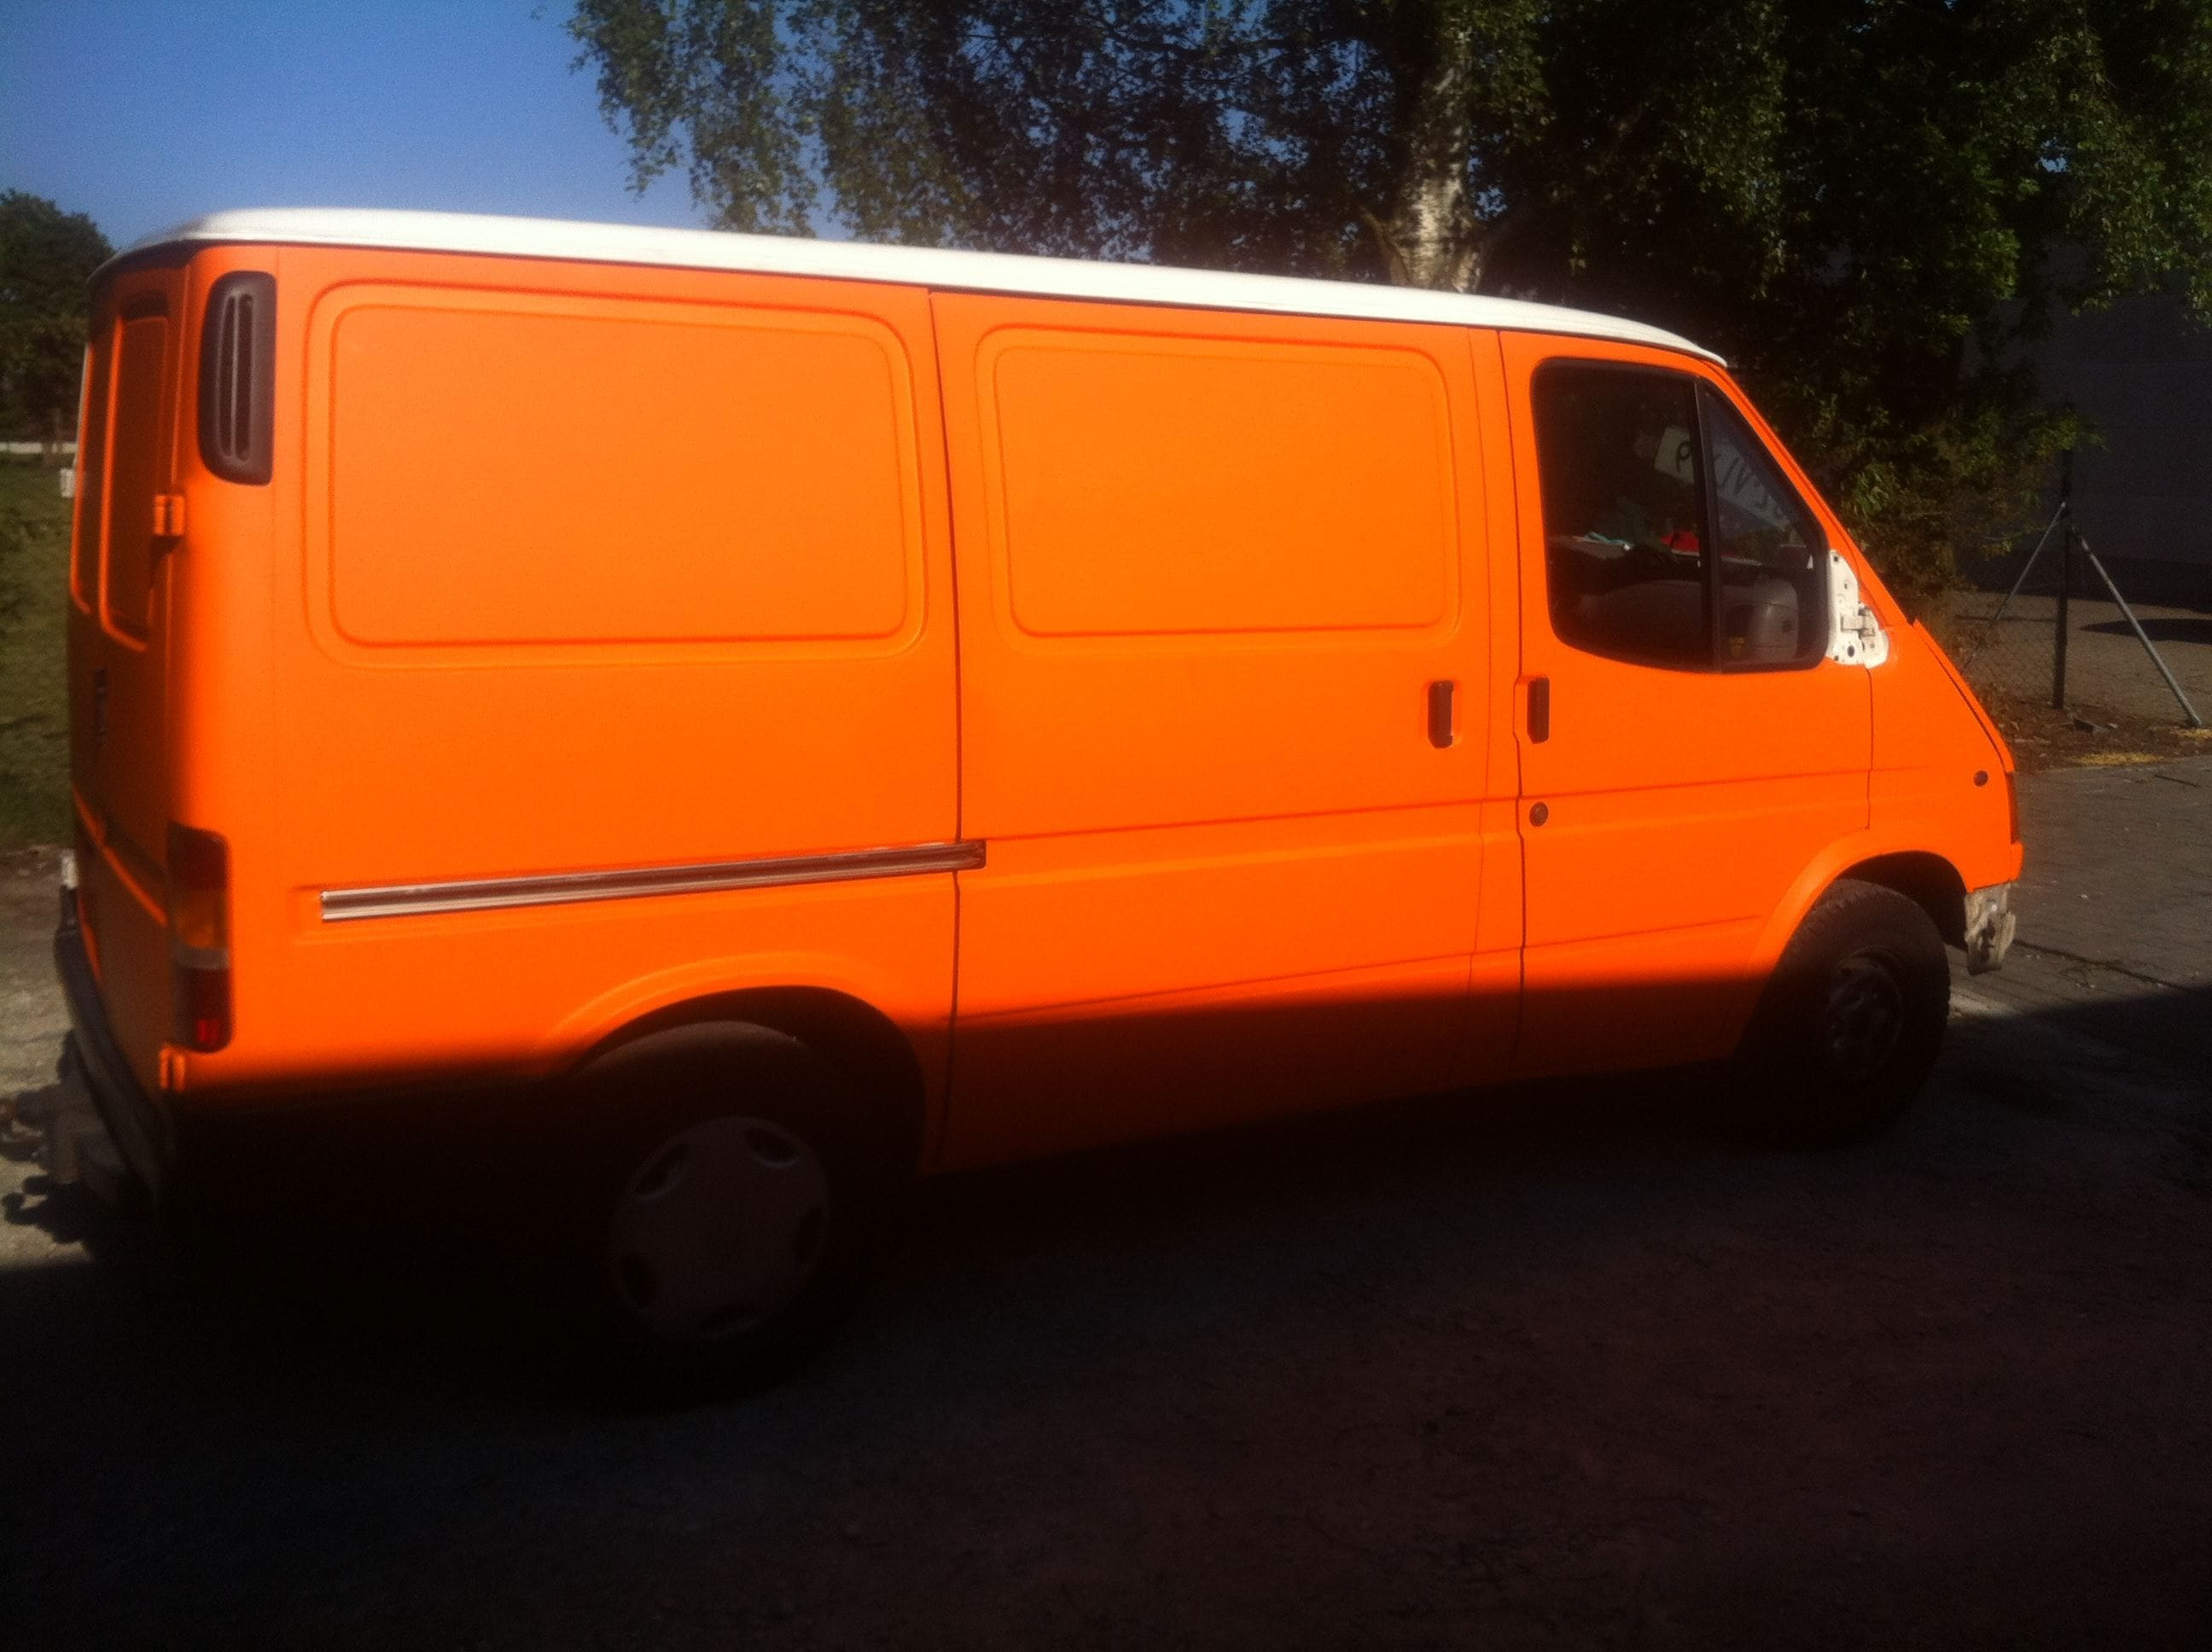 Ford Transit met Mat Oranje Wrap, Carwrapping door Wrapmyride.nu Foto-nr:5844, ©2020